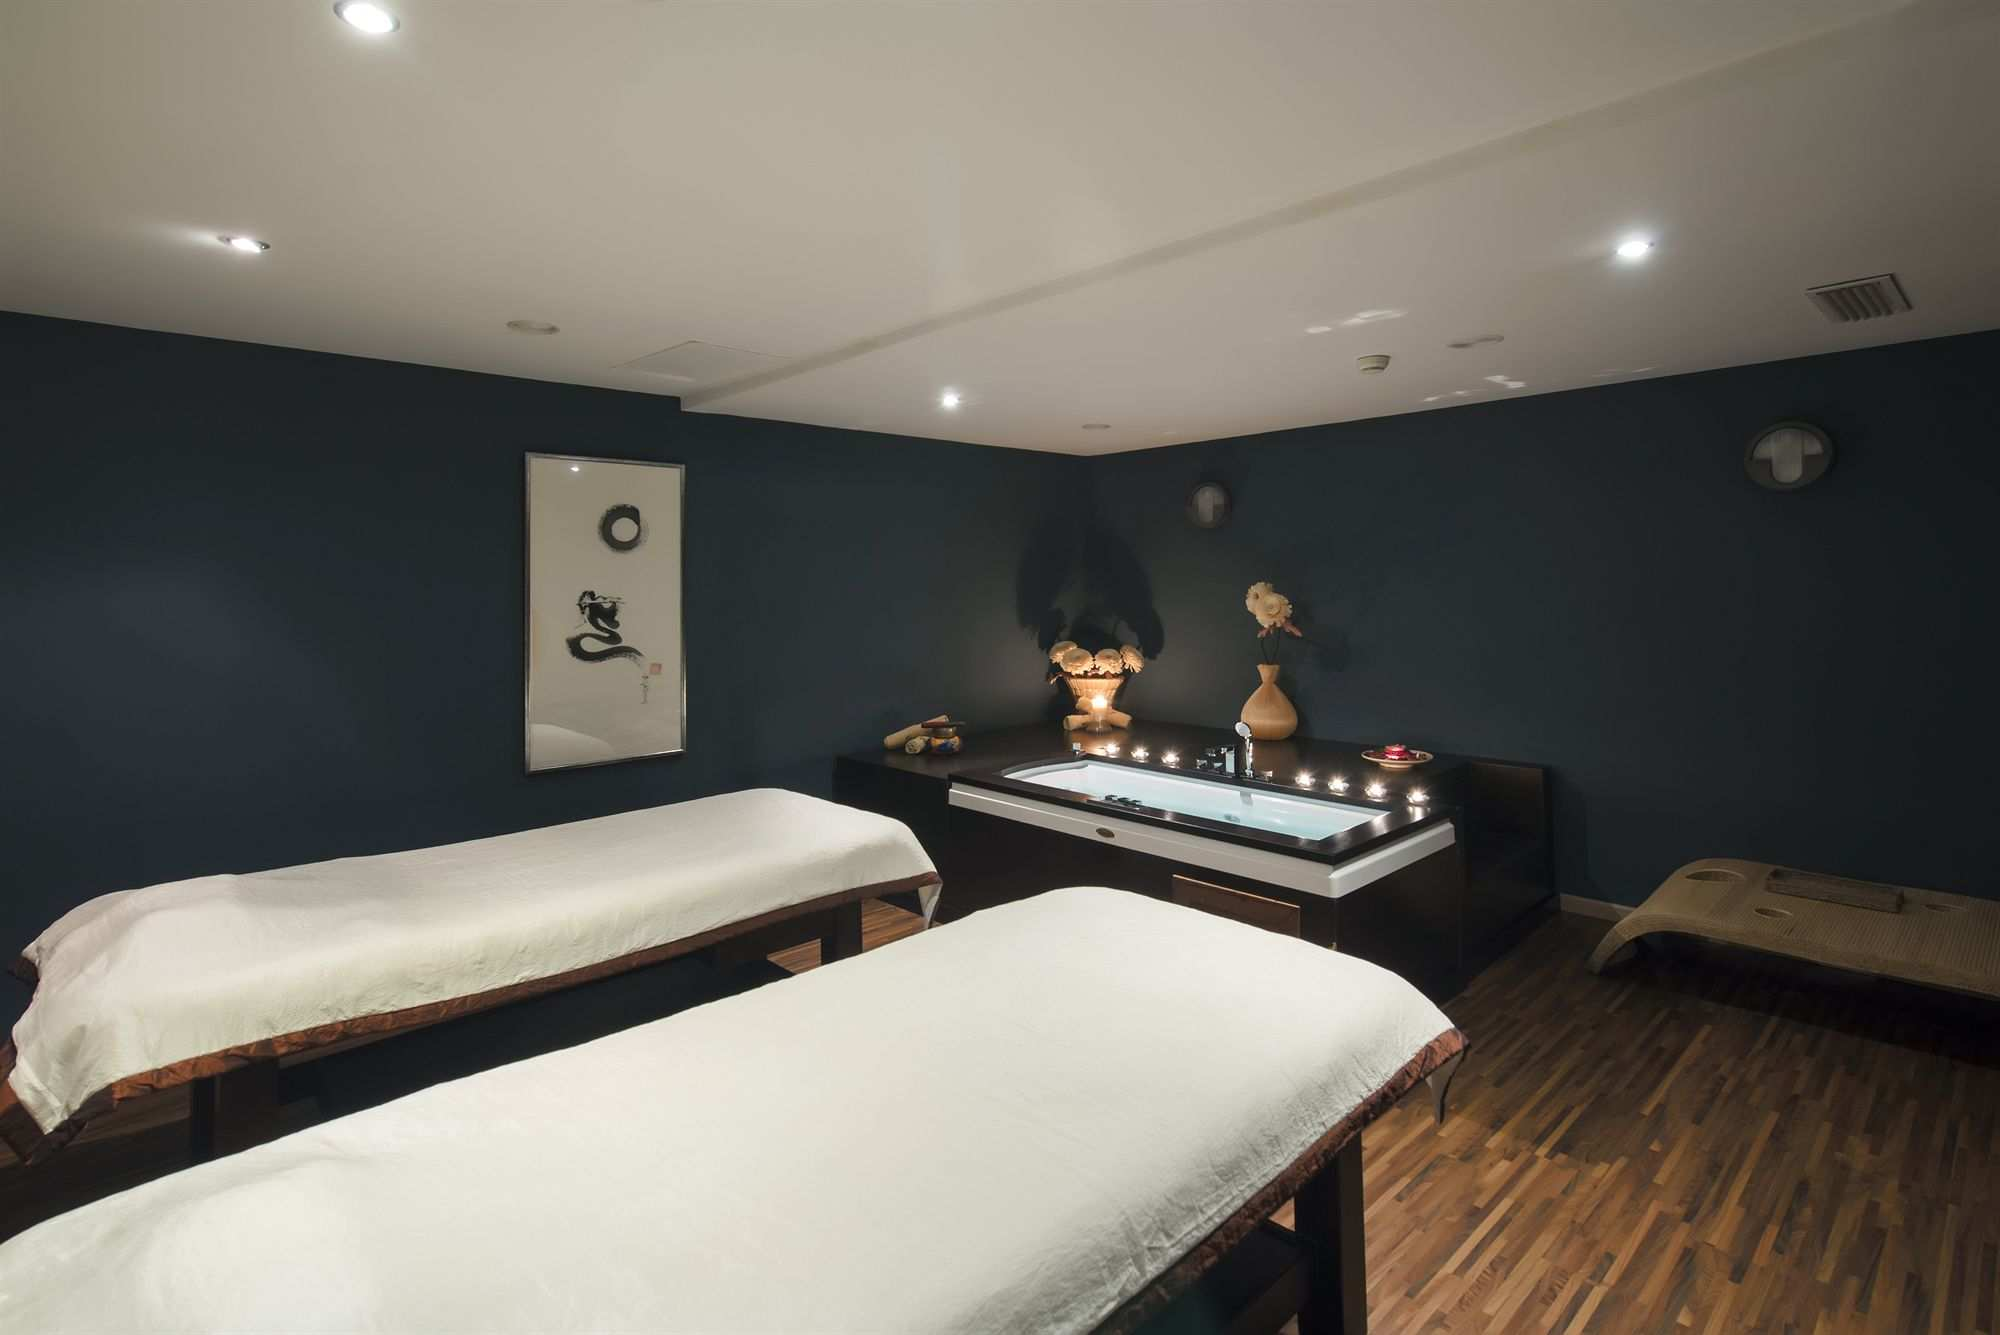 santa-ponsa-spainiberostar-suites-hotel-jardín-del-sol-adults-only-635947644665999270.jpg